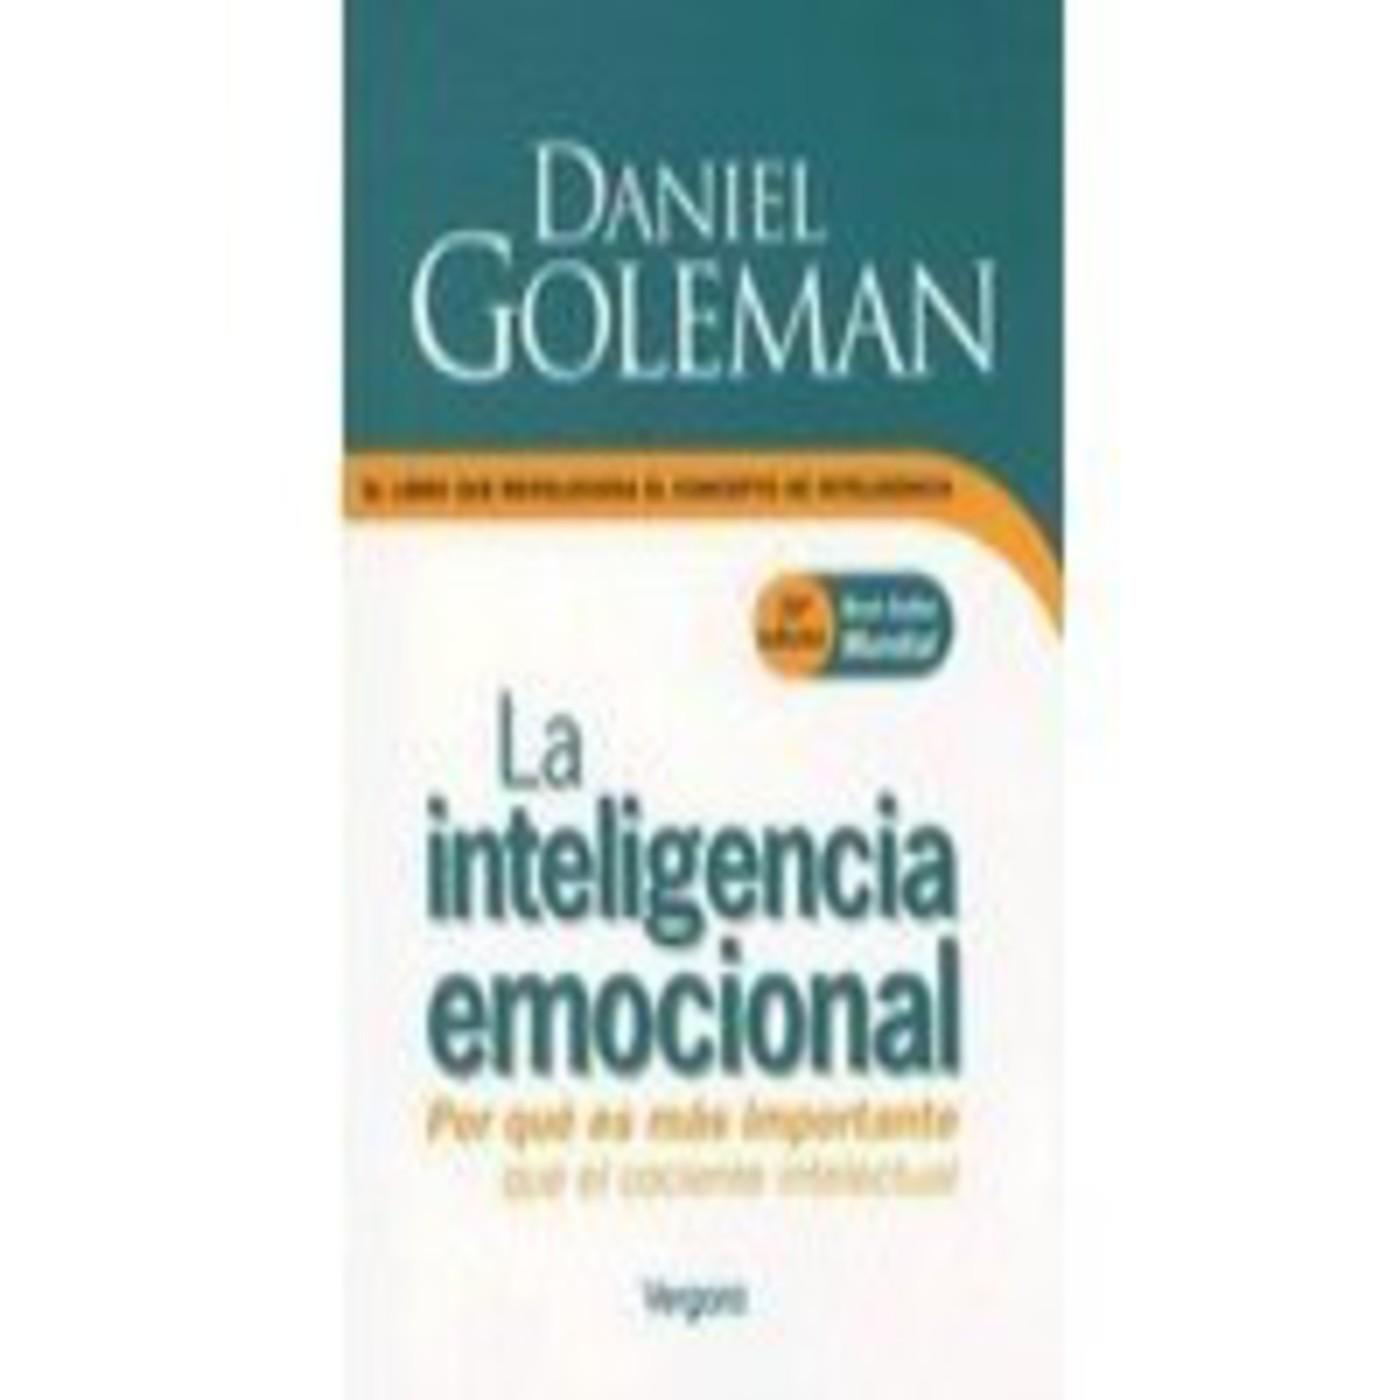 46..INTELIGENCIA EMOCIONAL, Daniel Goleman